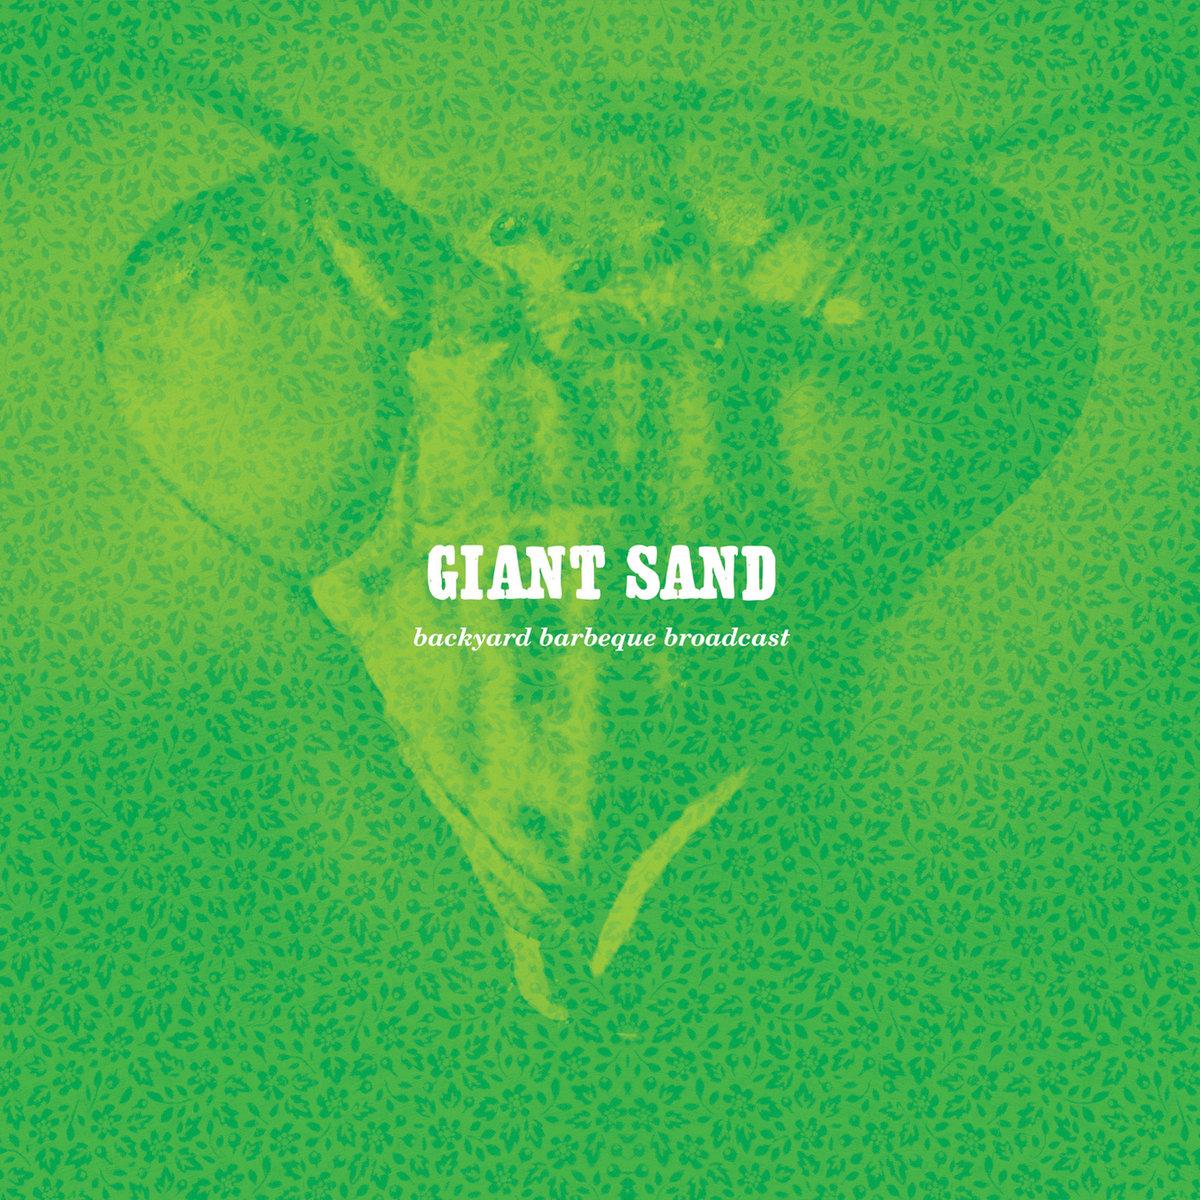 backyard bbq broadcast giant sand